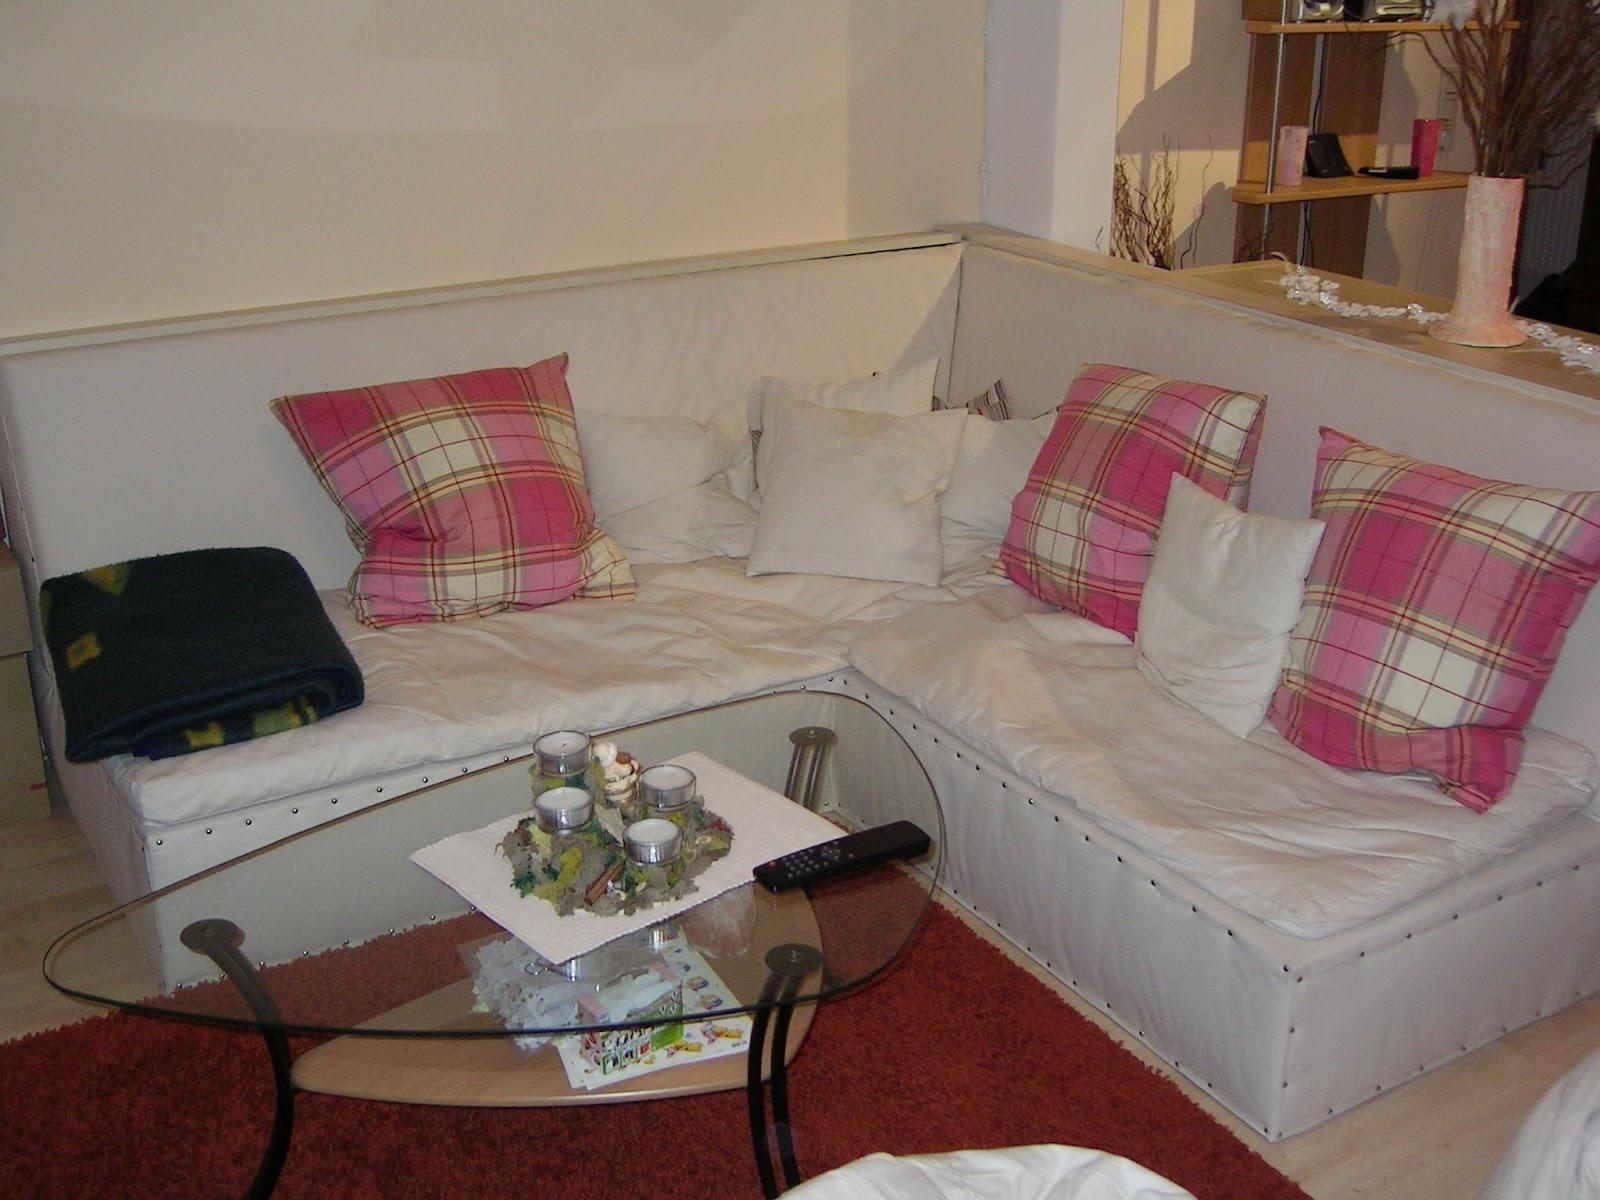 hartz 4 sofa great bsofa with hartz 4 sofa affordable cheap fabelhafte betten selbst bauen. Black Bedroom Furniture Sets. Home Design Ideas